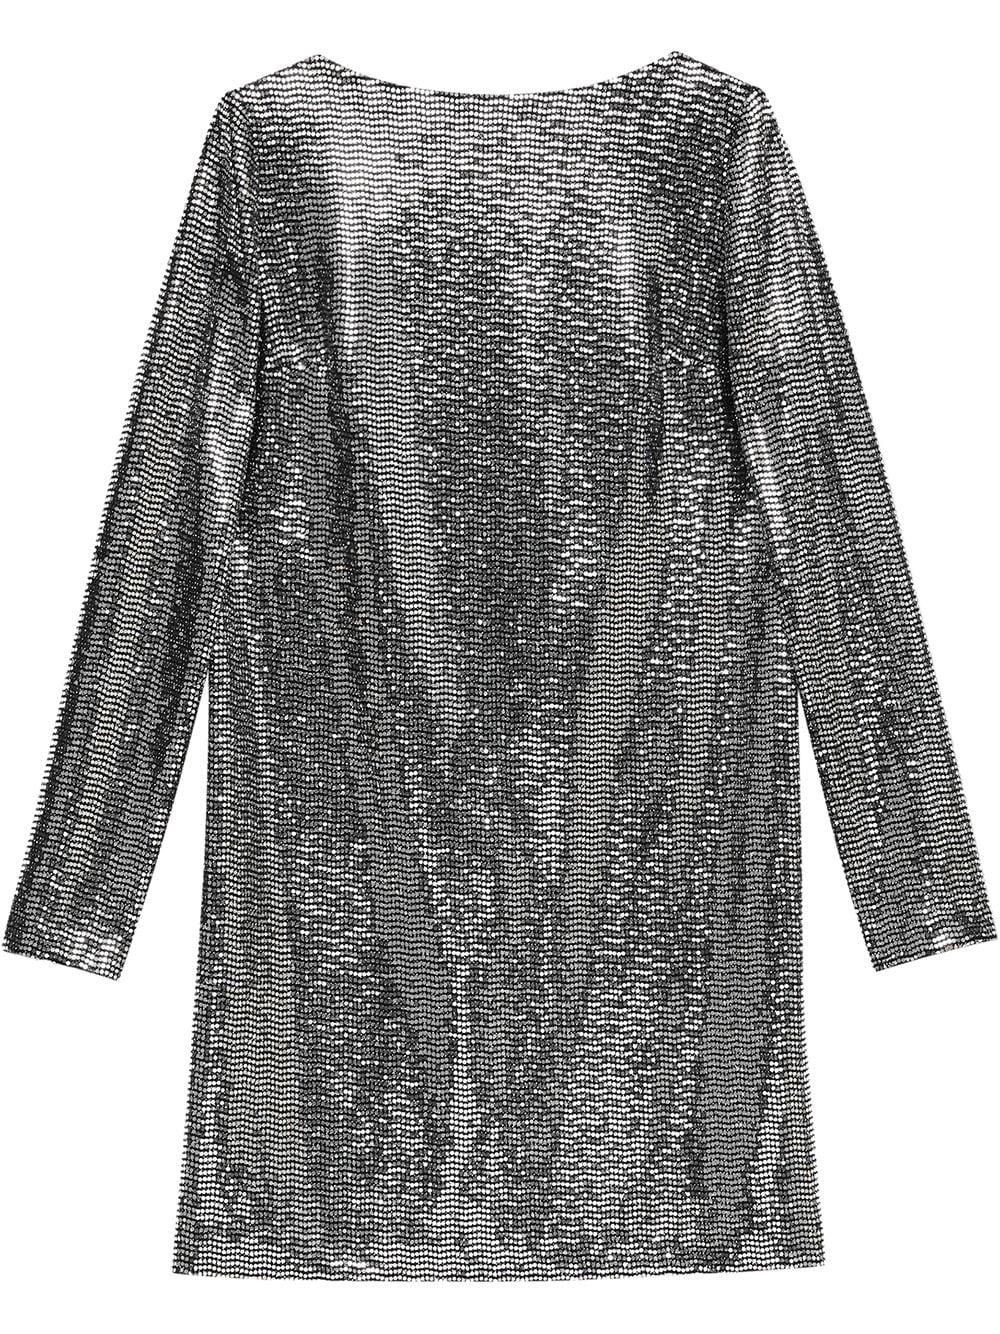 Metallic Dotted Jersey Dress